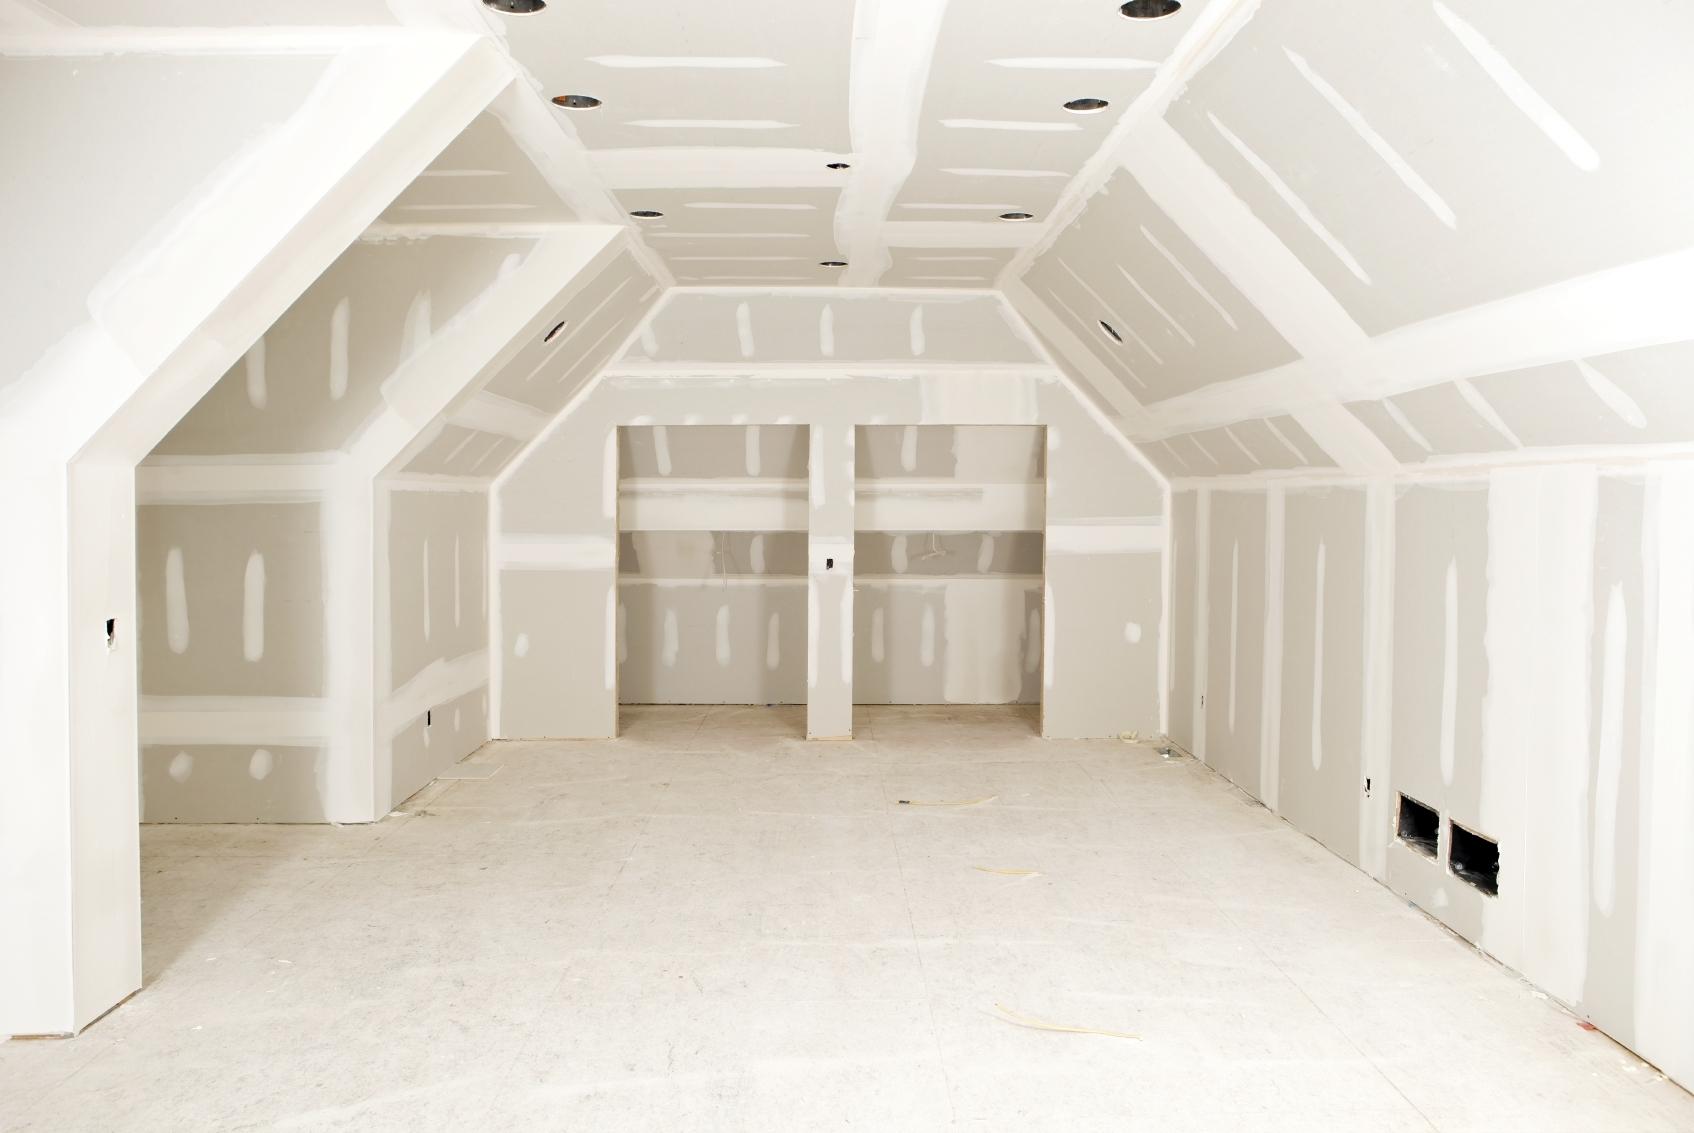 Заделка трещин на гипсокартонном потолке